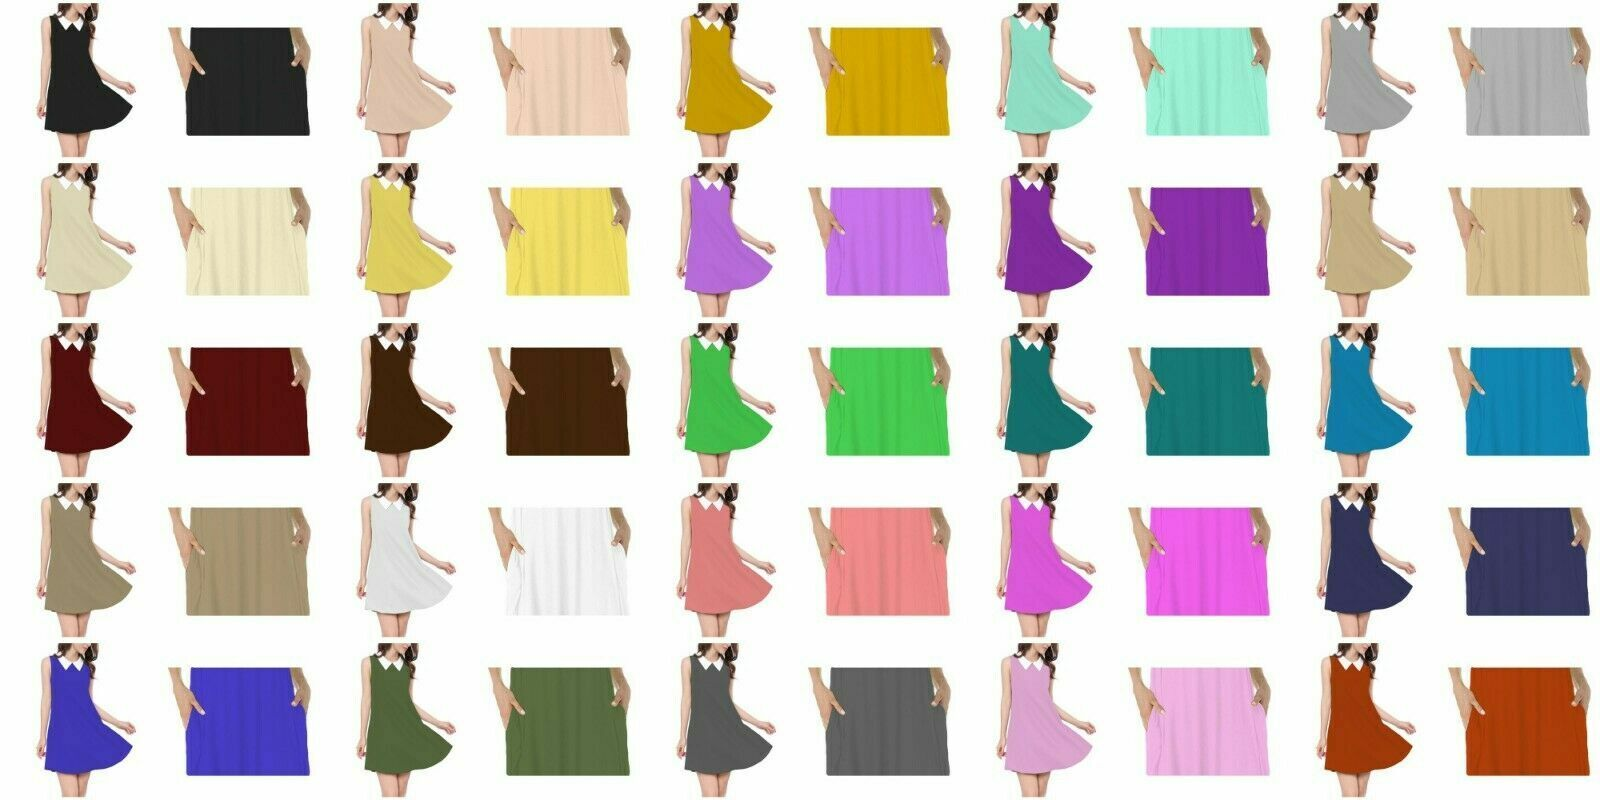 Papaval KCSSD Kids Girls Sleeveless Plain Casual Loose Skater Swing Dress